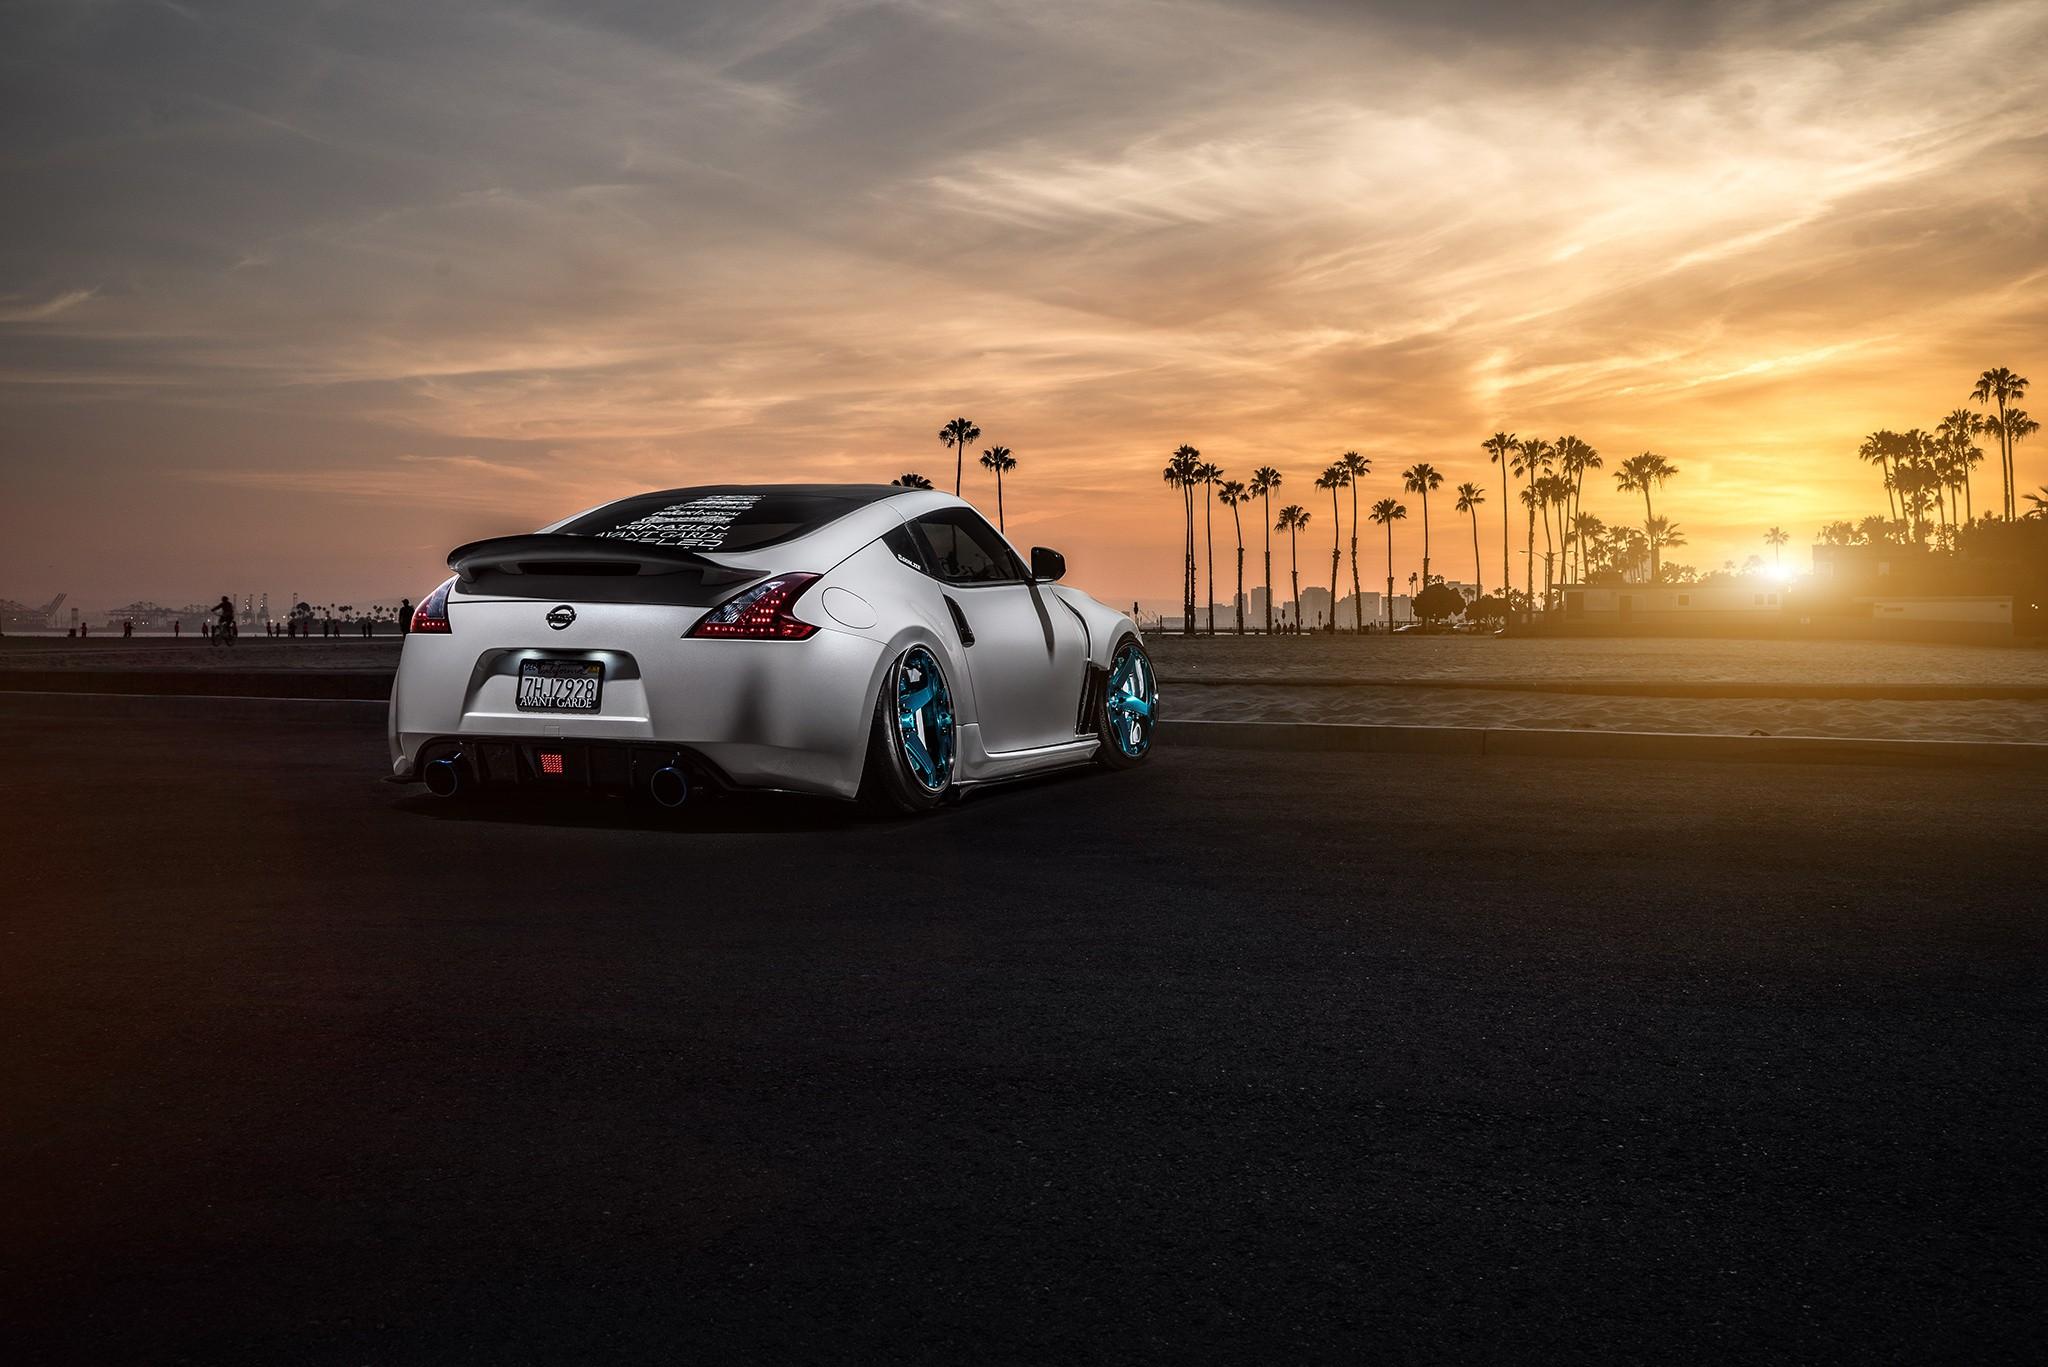 Sports Car Desktop Backgrounds